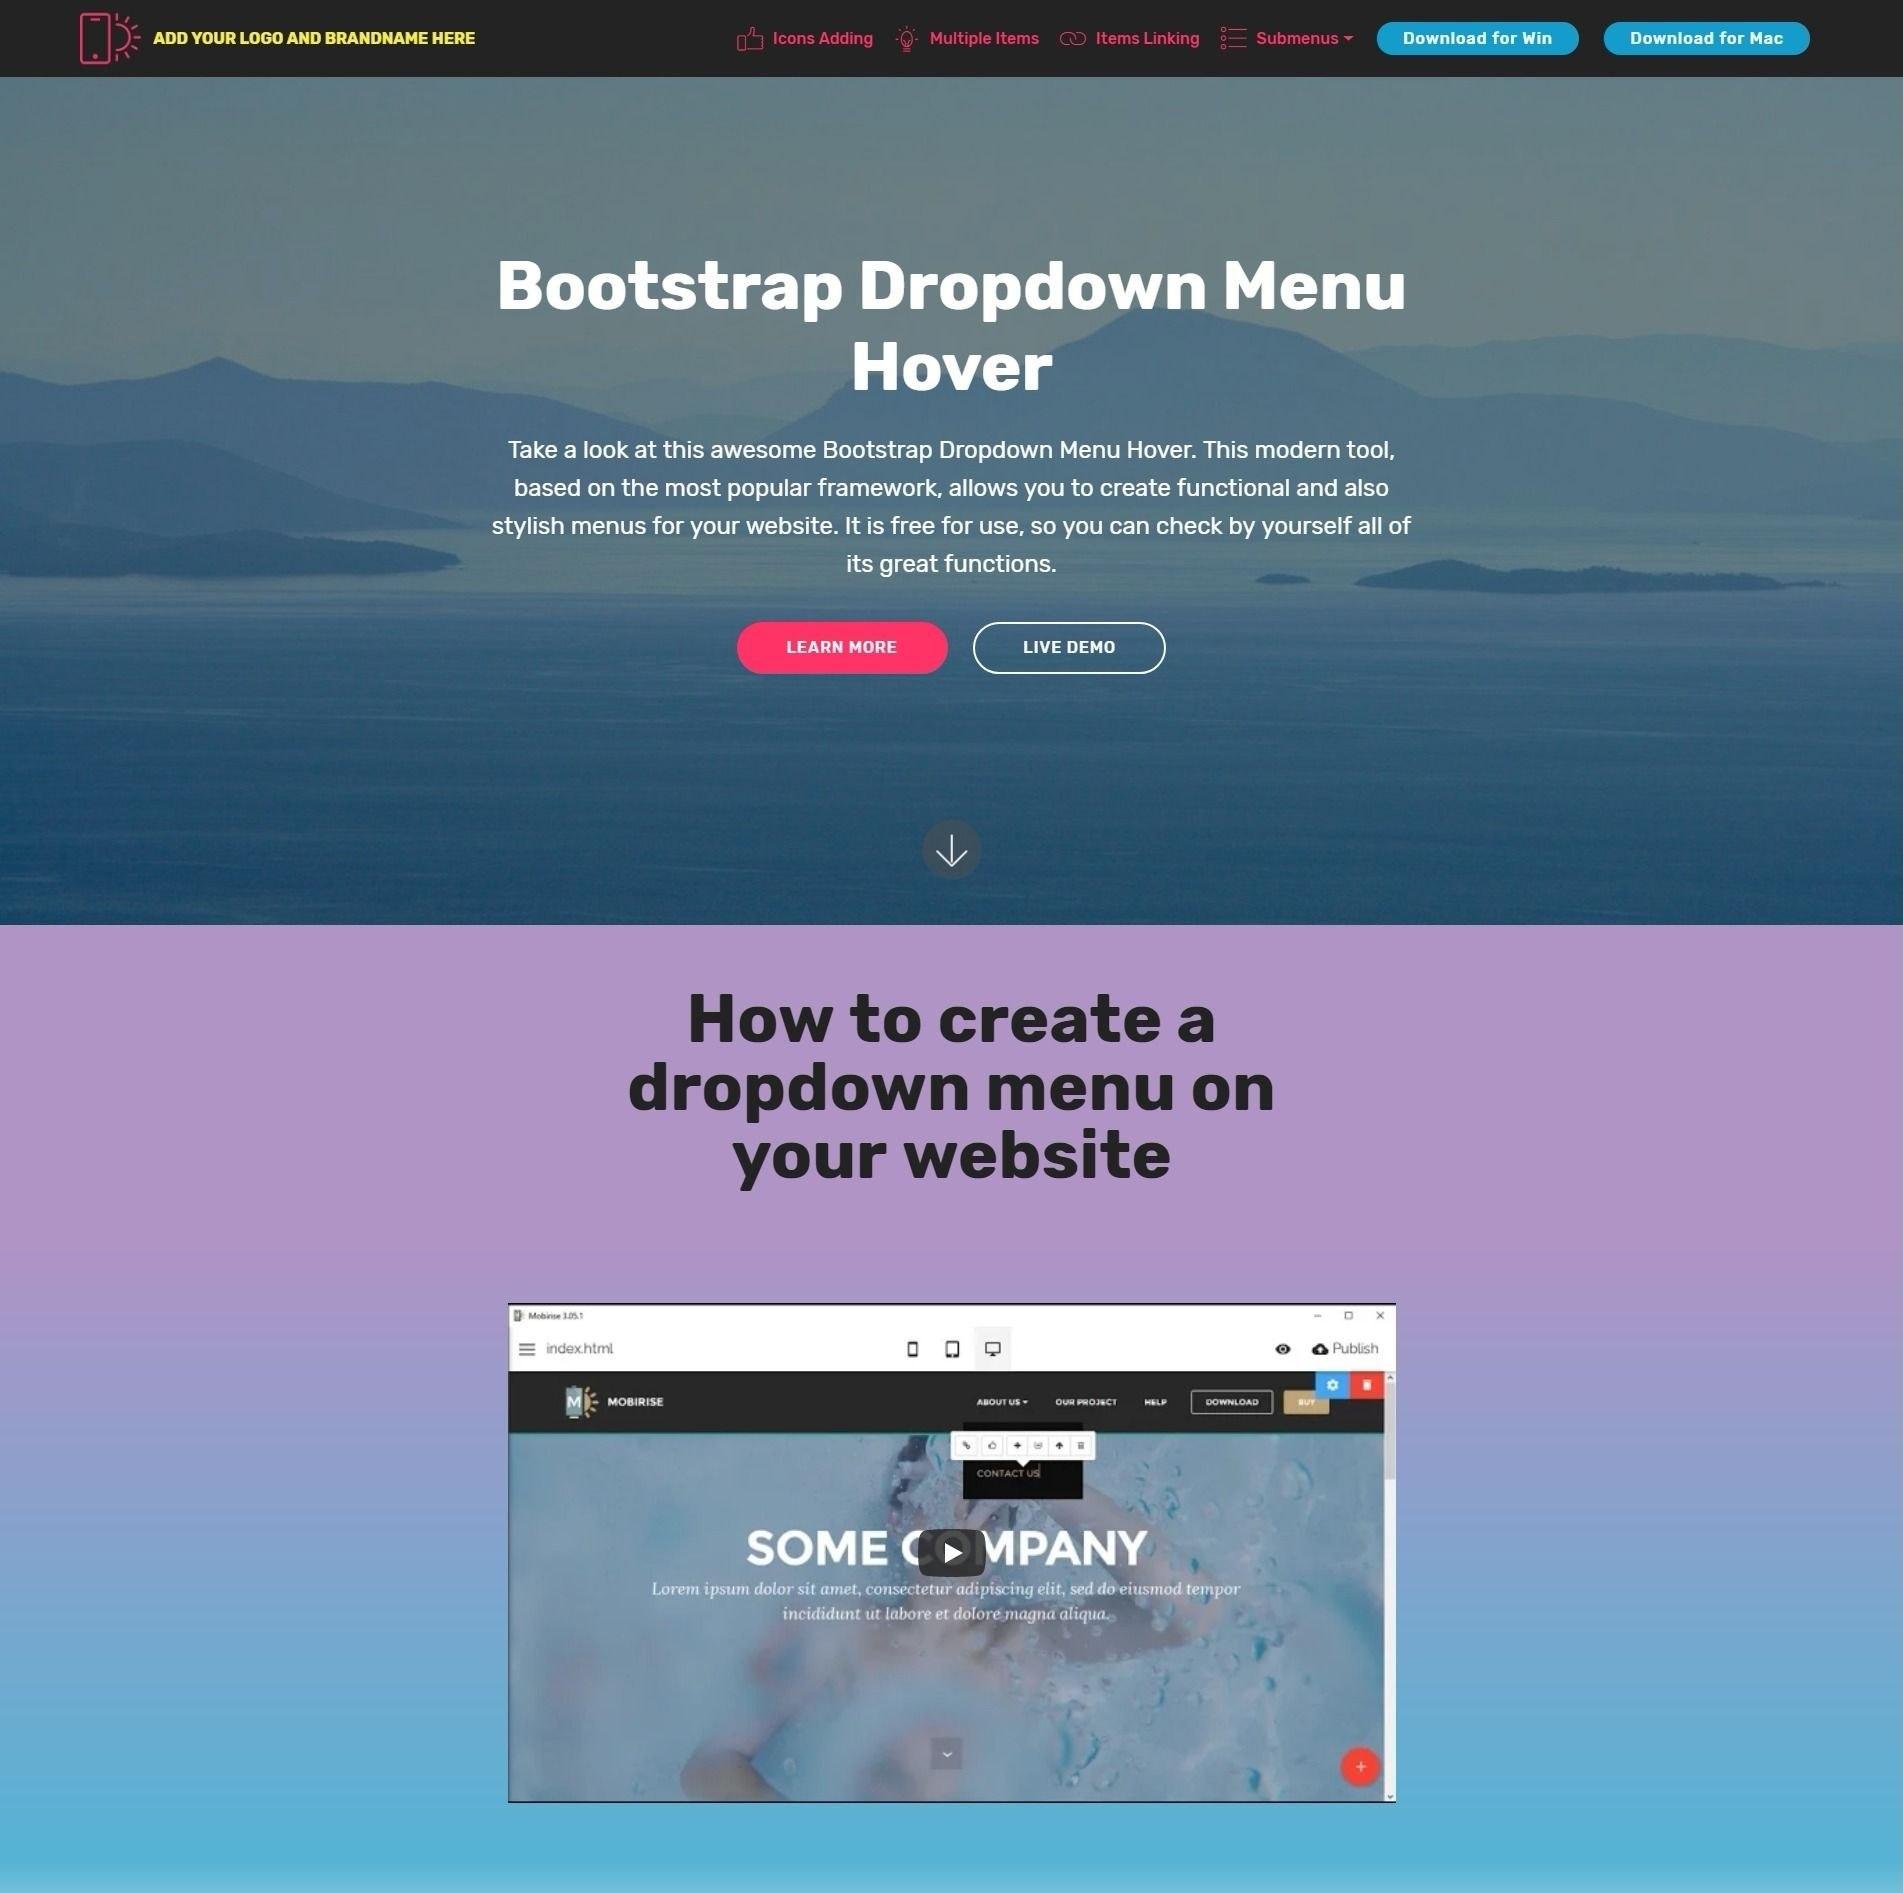 Bootstrap Dropdown Menu Hover With Drop Down Menu Templates Free Download